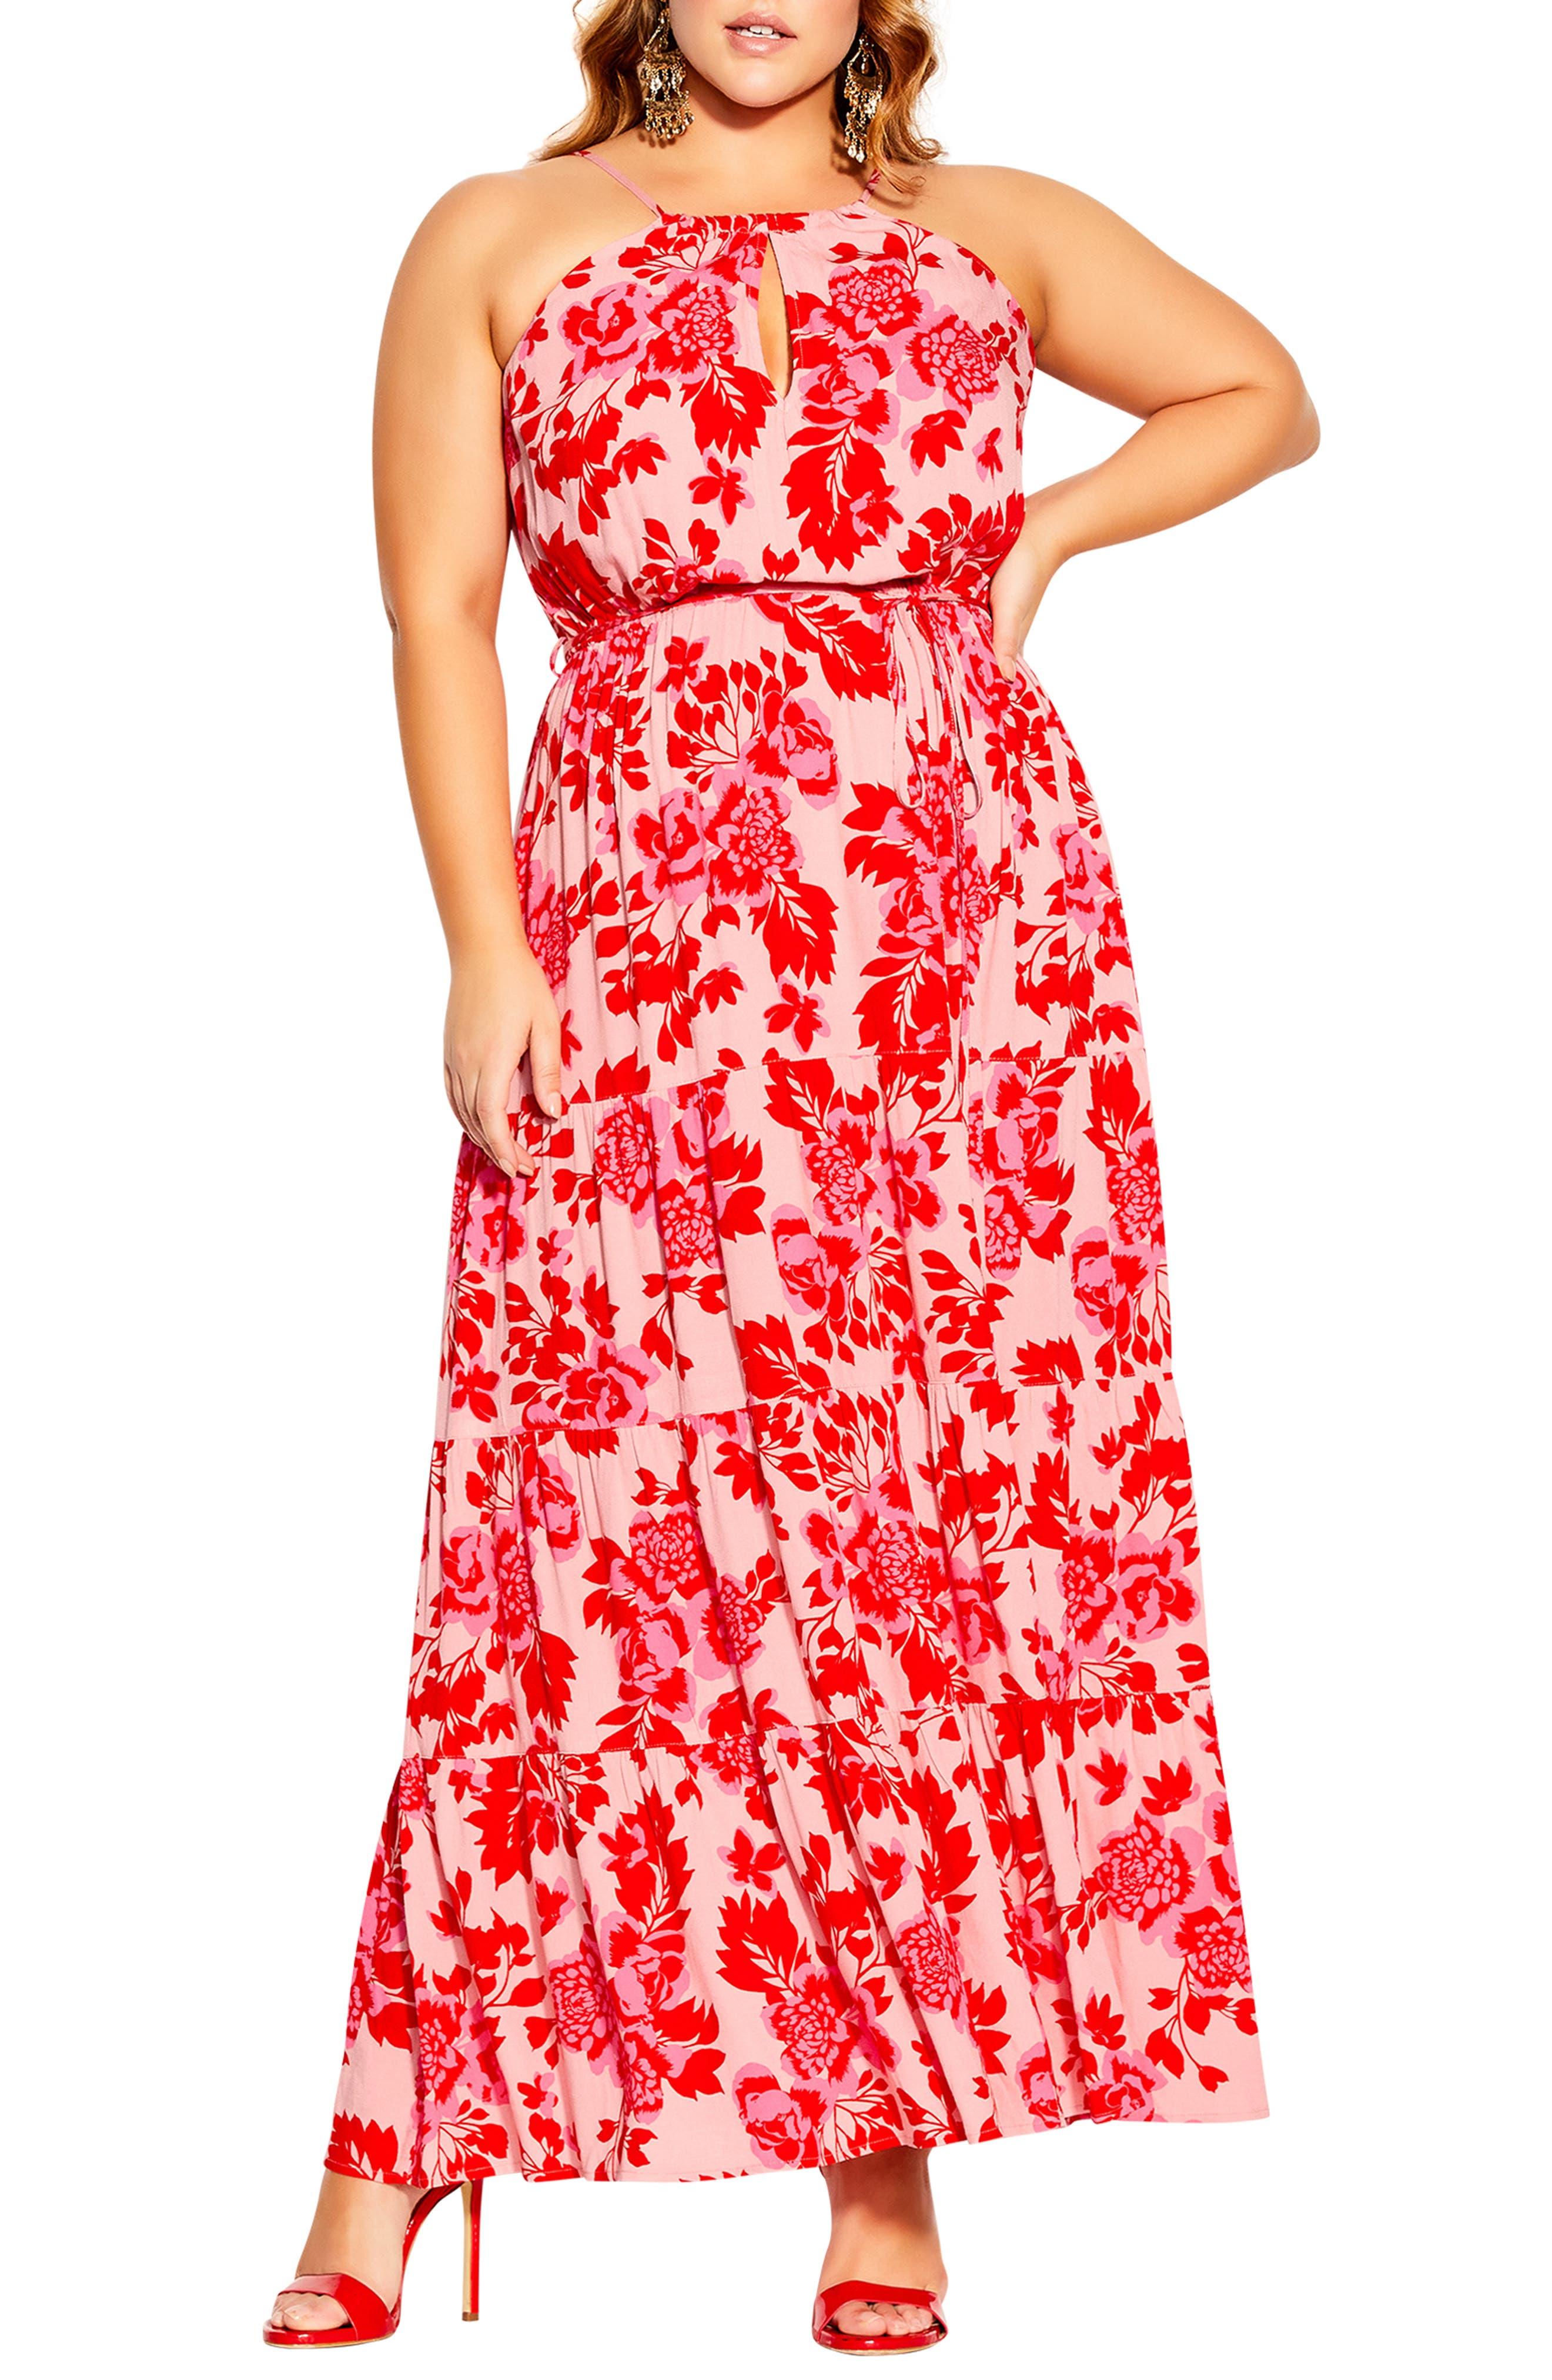 Scarlet Floral Maxi Dress